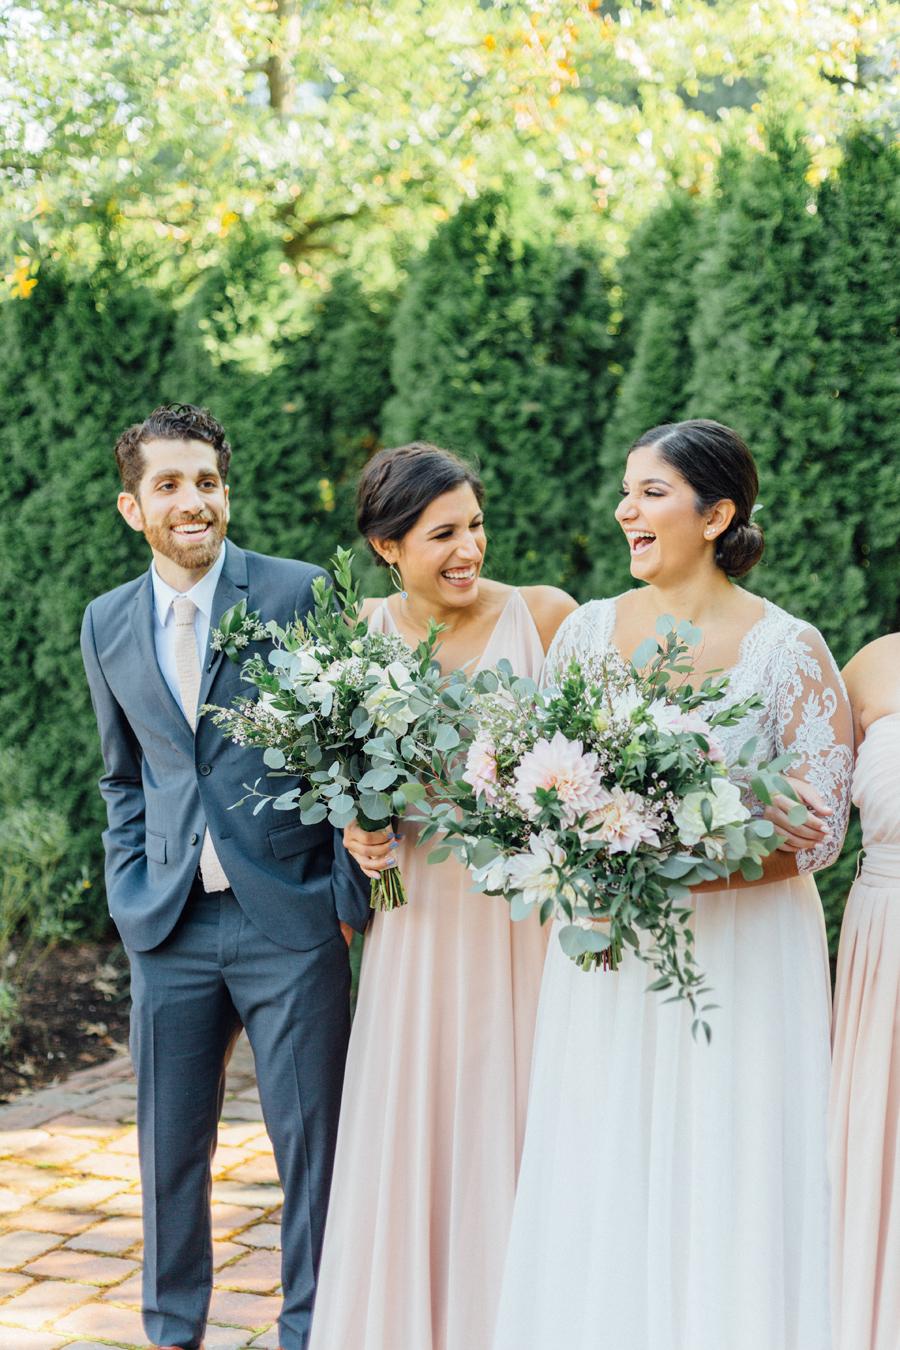 the-inn-at-leola-wedding-lancaster-pennsylvania-wedding-photographer-rebeka-viola-photograhy (29).jpg